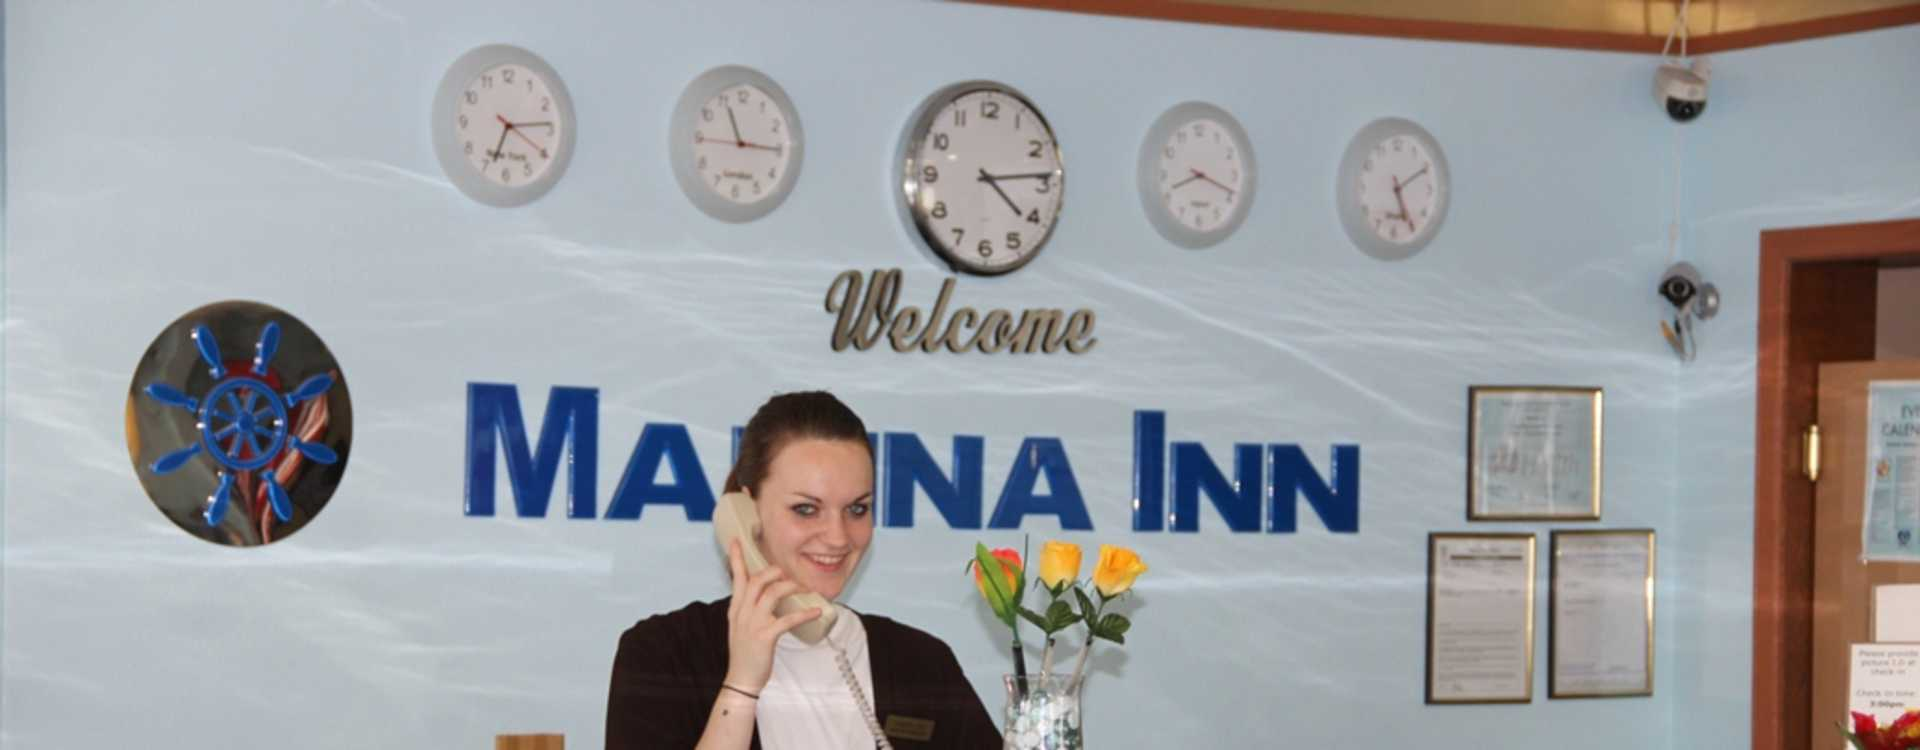 Marina_Inn-3.jpg